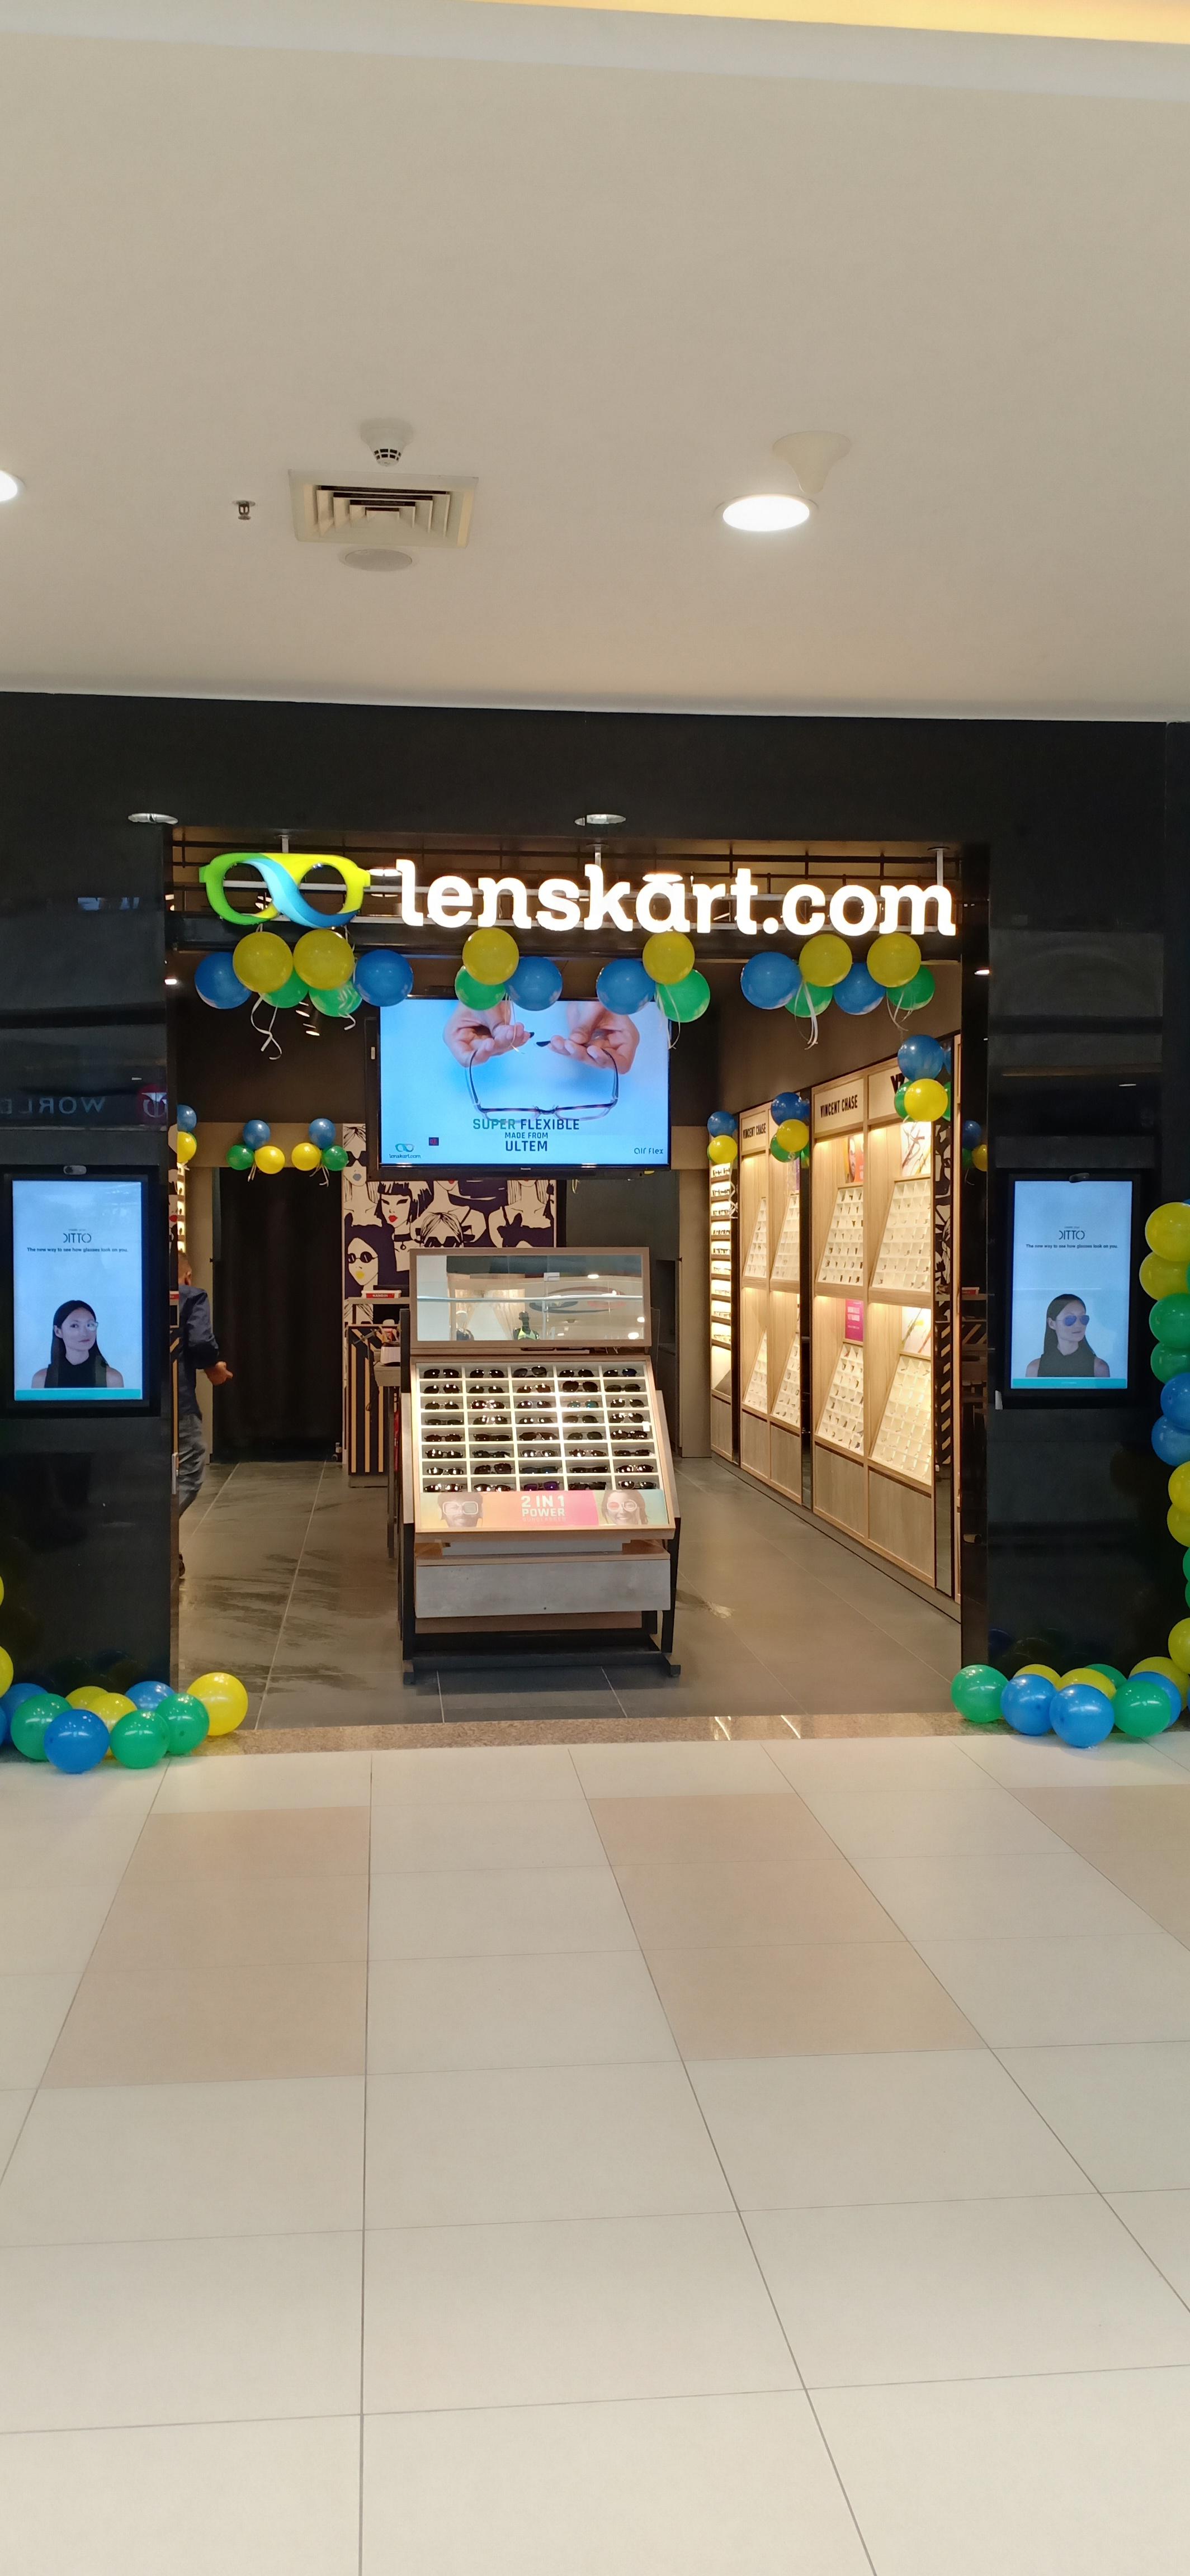 Lenskart.com - Alpha One Mall, Ahmedabad